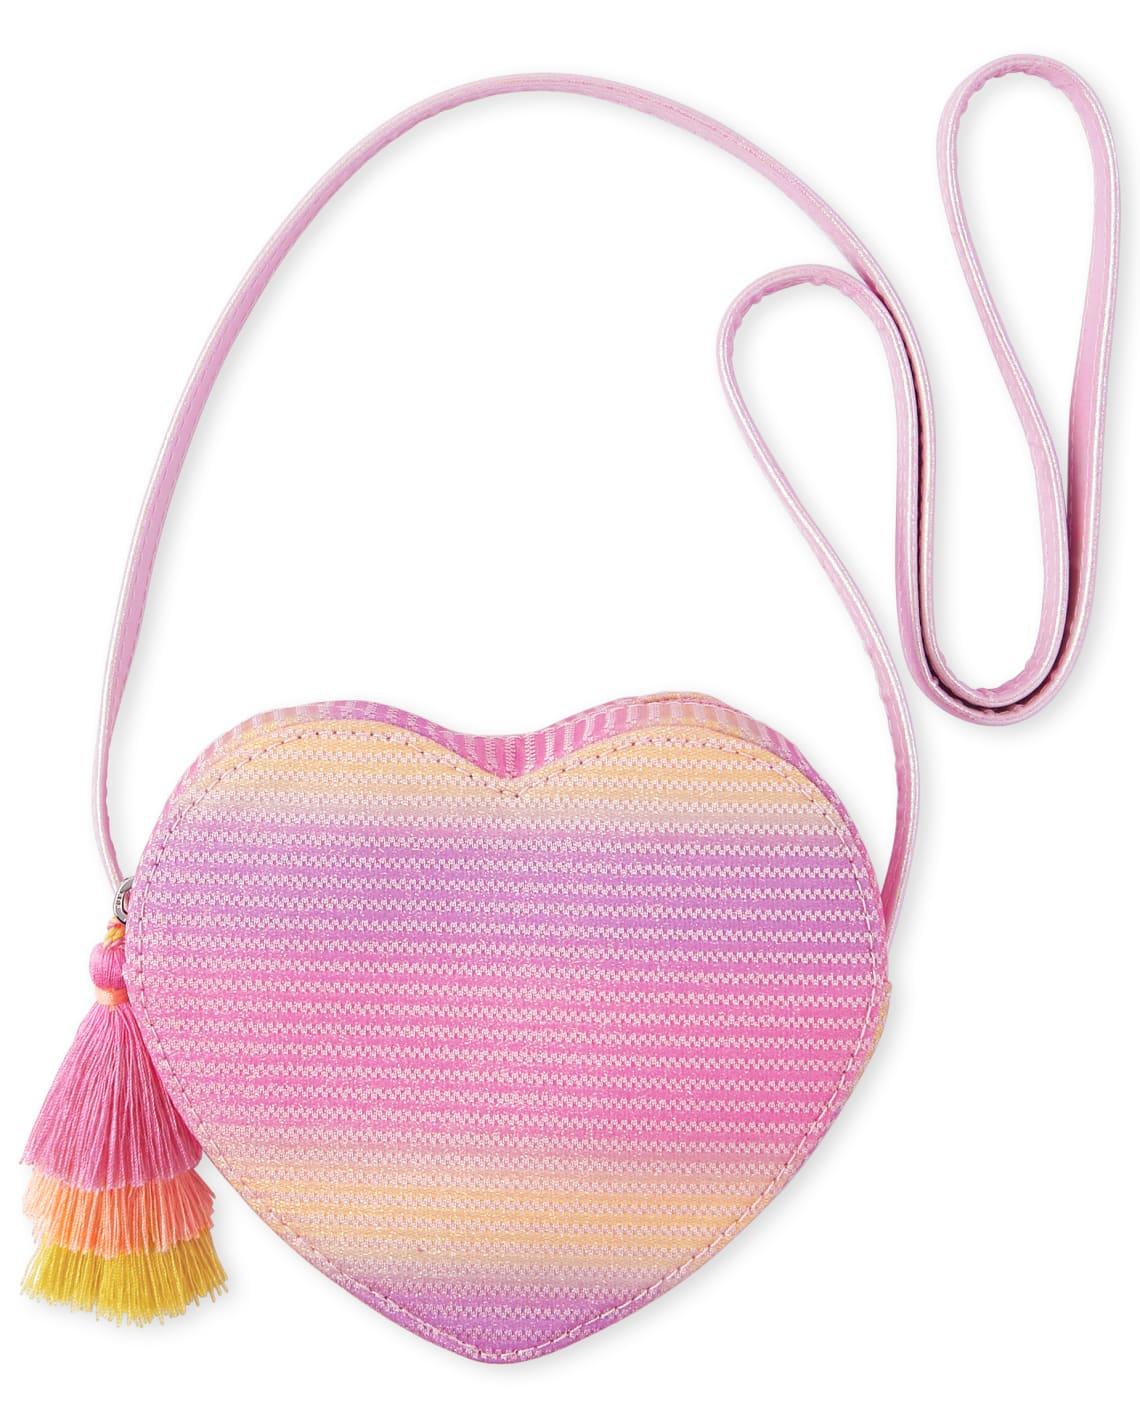 The Childrens Place Girls Glitter Heart Bag